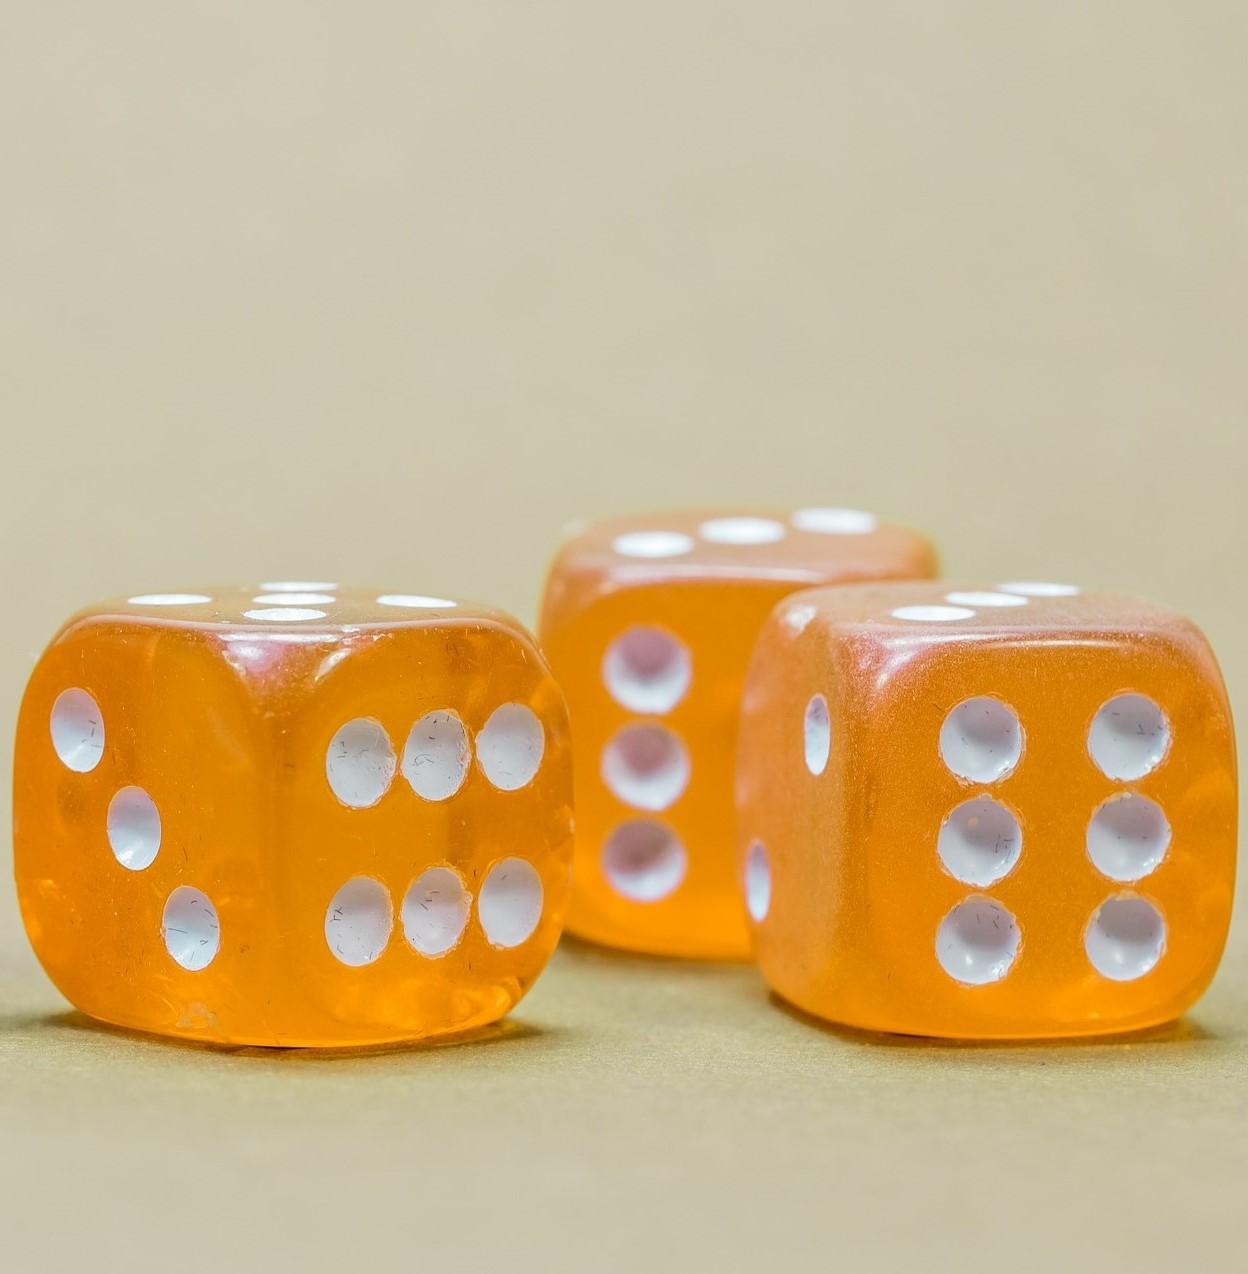 cube-568193_1920